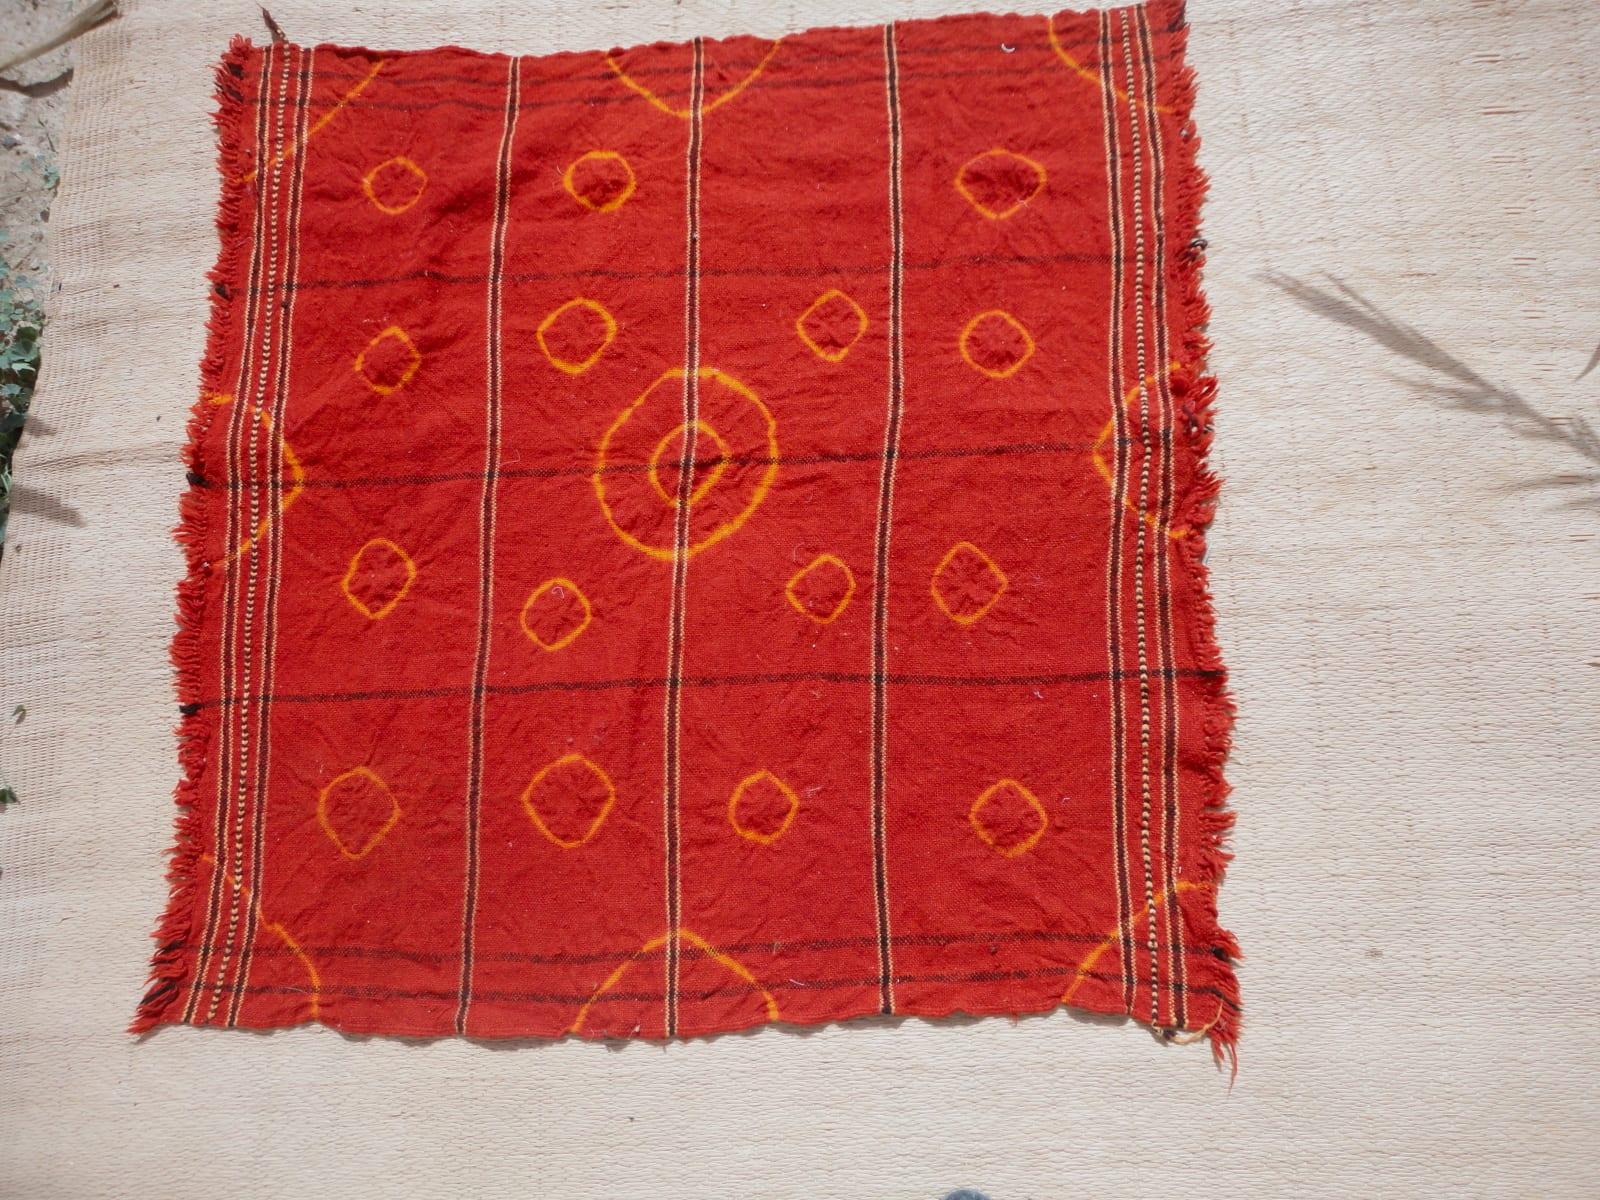 Mendeel Fabric Wool Red, Yellow Morocco